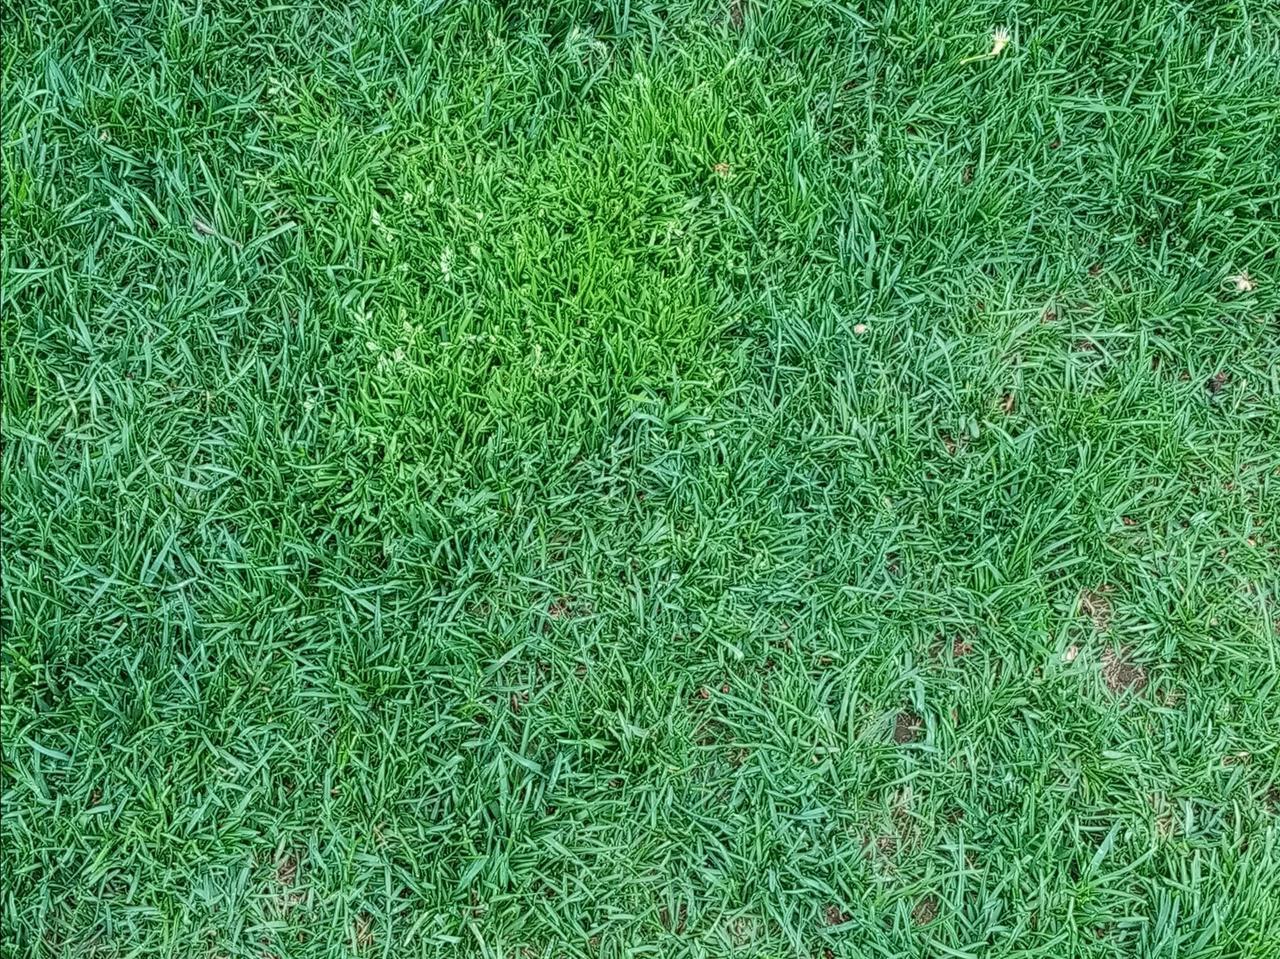 helminthosporium levél foltos gyep